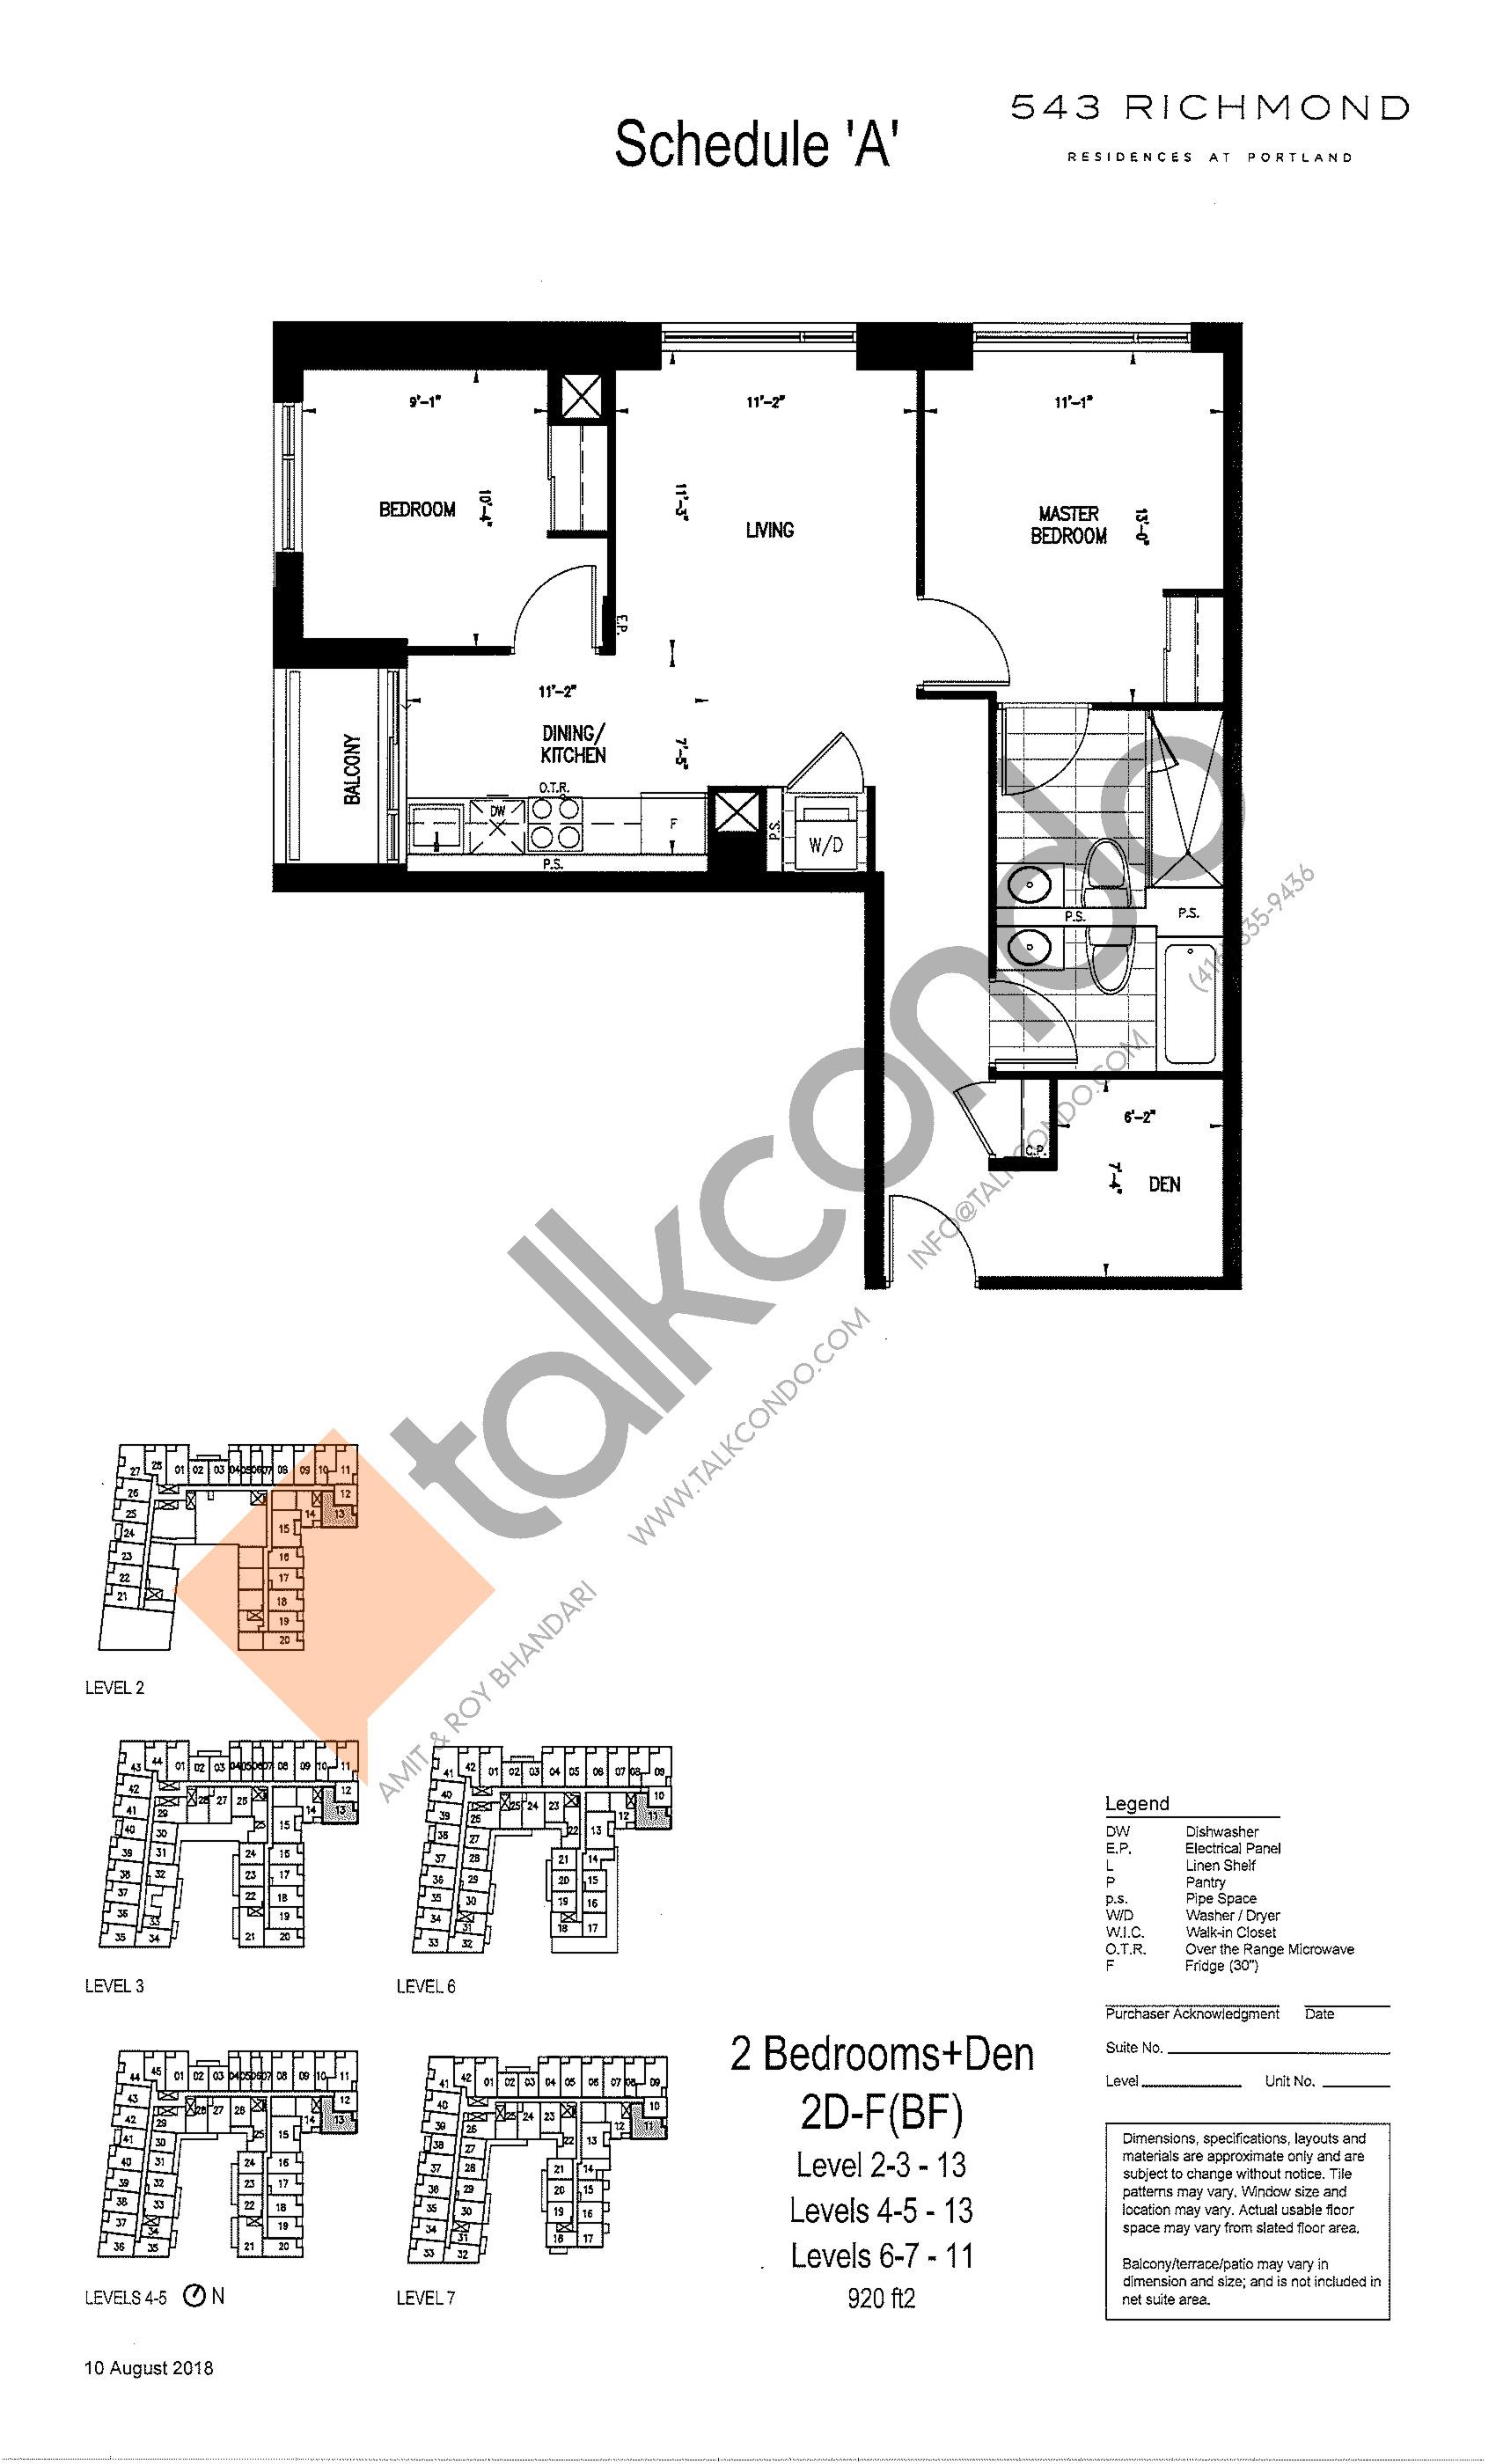 2D-F(BF) Floor Plan at 543 Richmond St Condos - 920 sq.ft